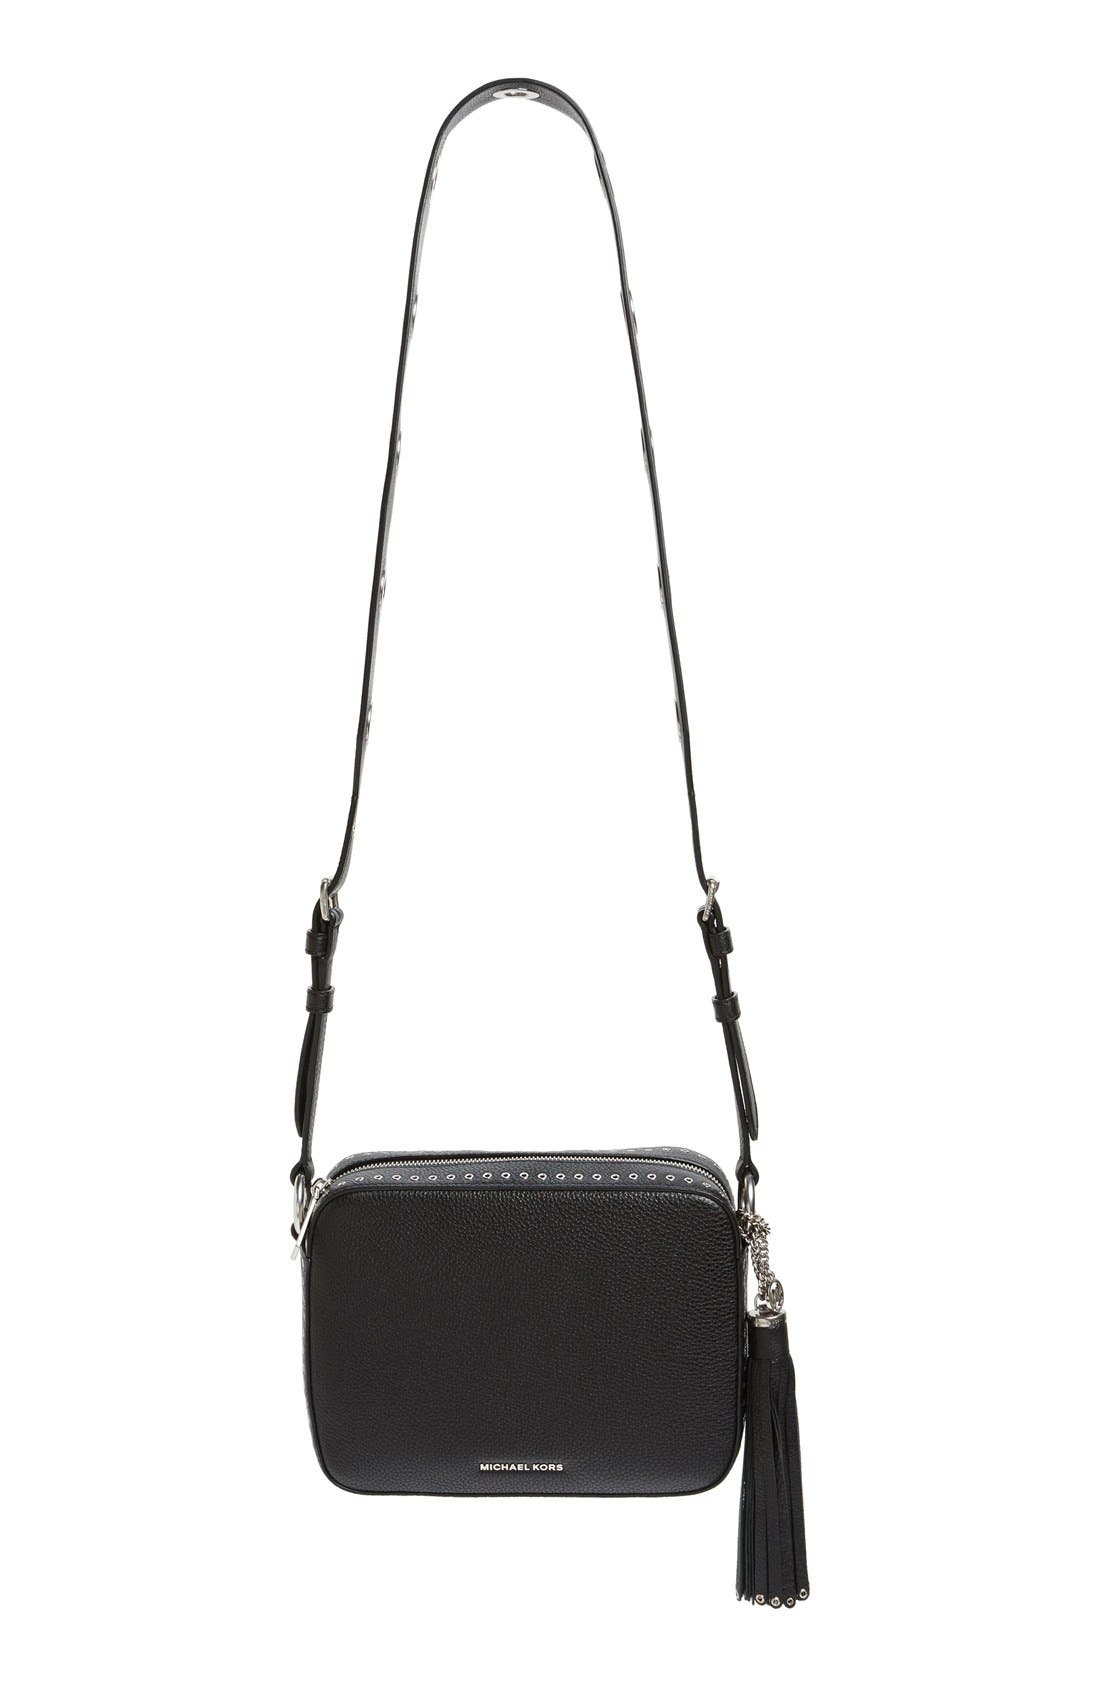 Alternate Image 1 Selected - MICHAEL Michael Kors 'Large Brooklyn' Leather Camera Bag